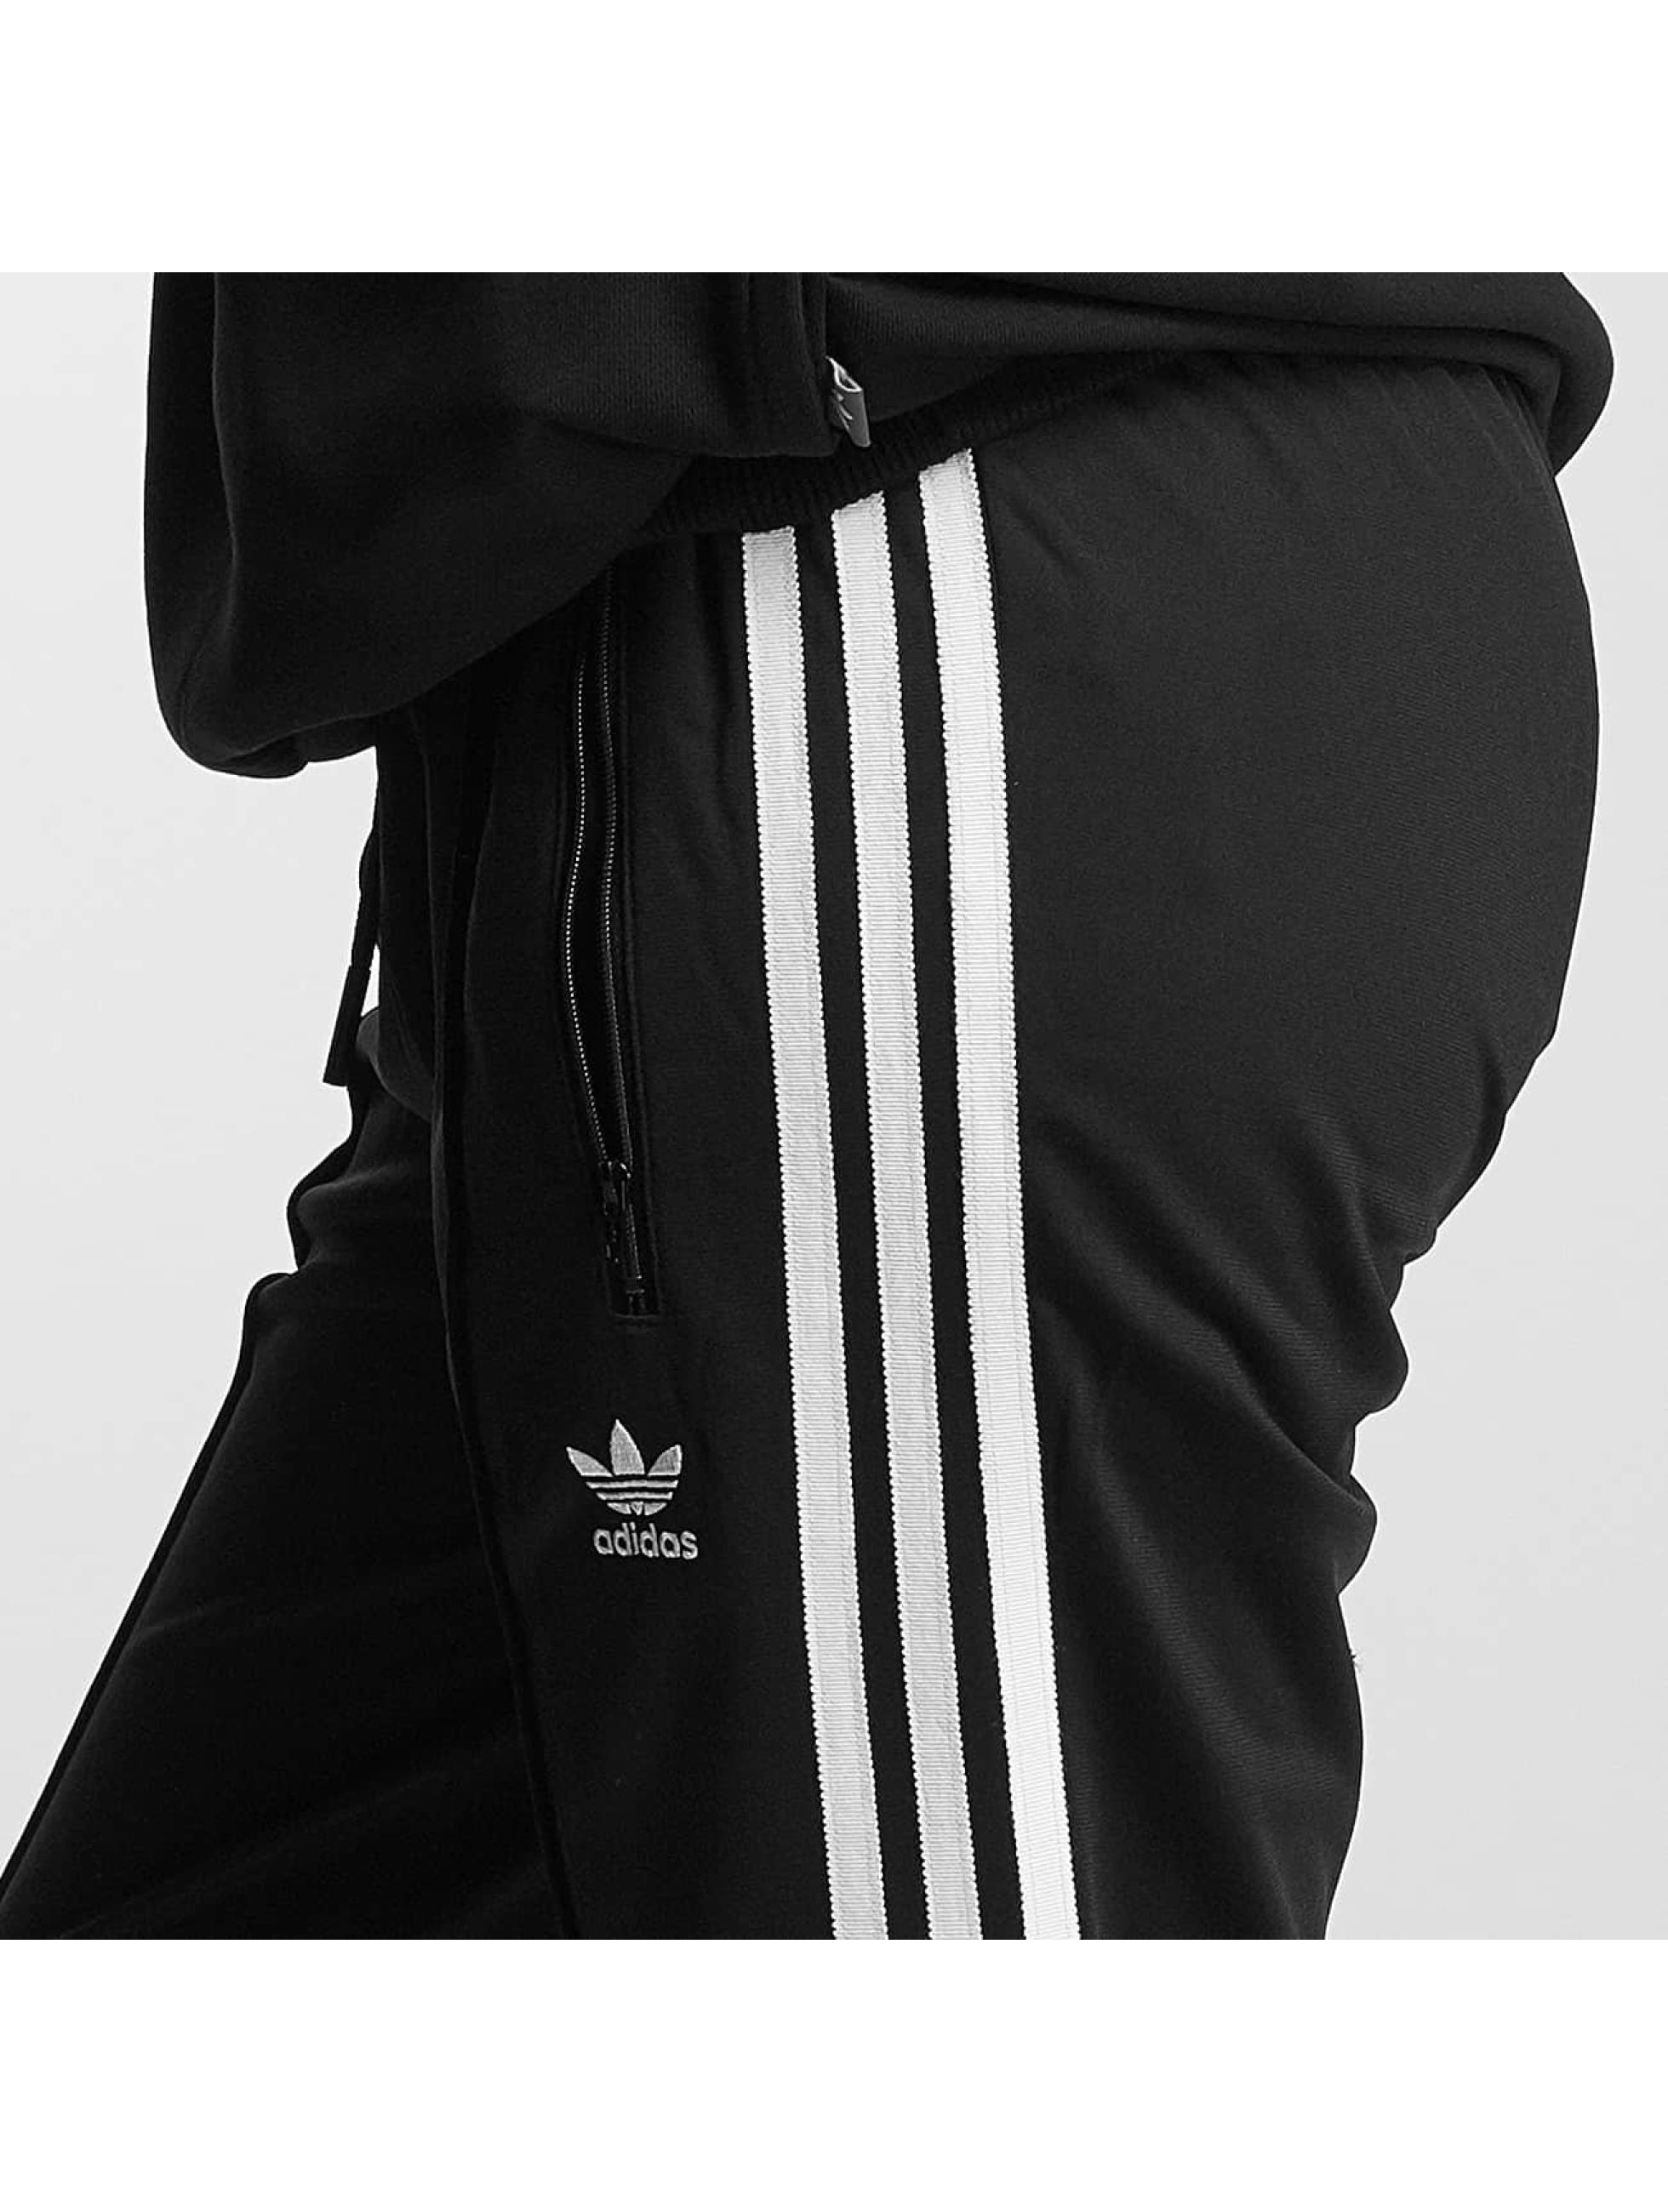 adidas Sweat Pant Cigarette black